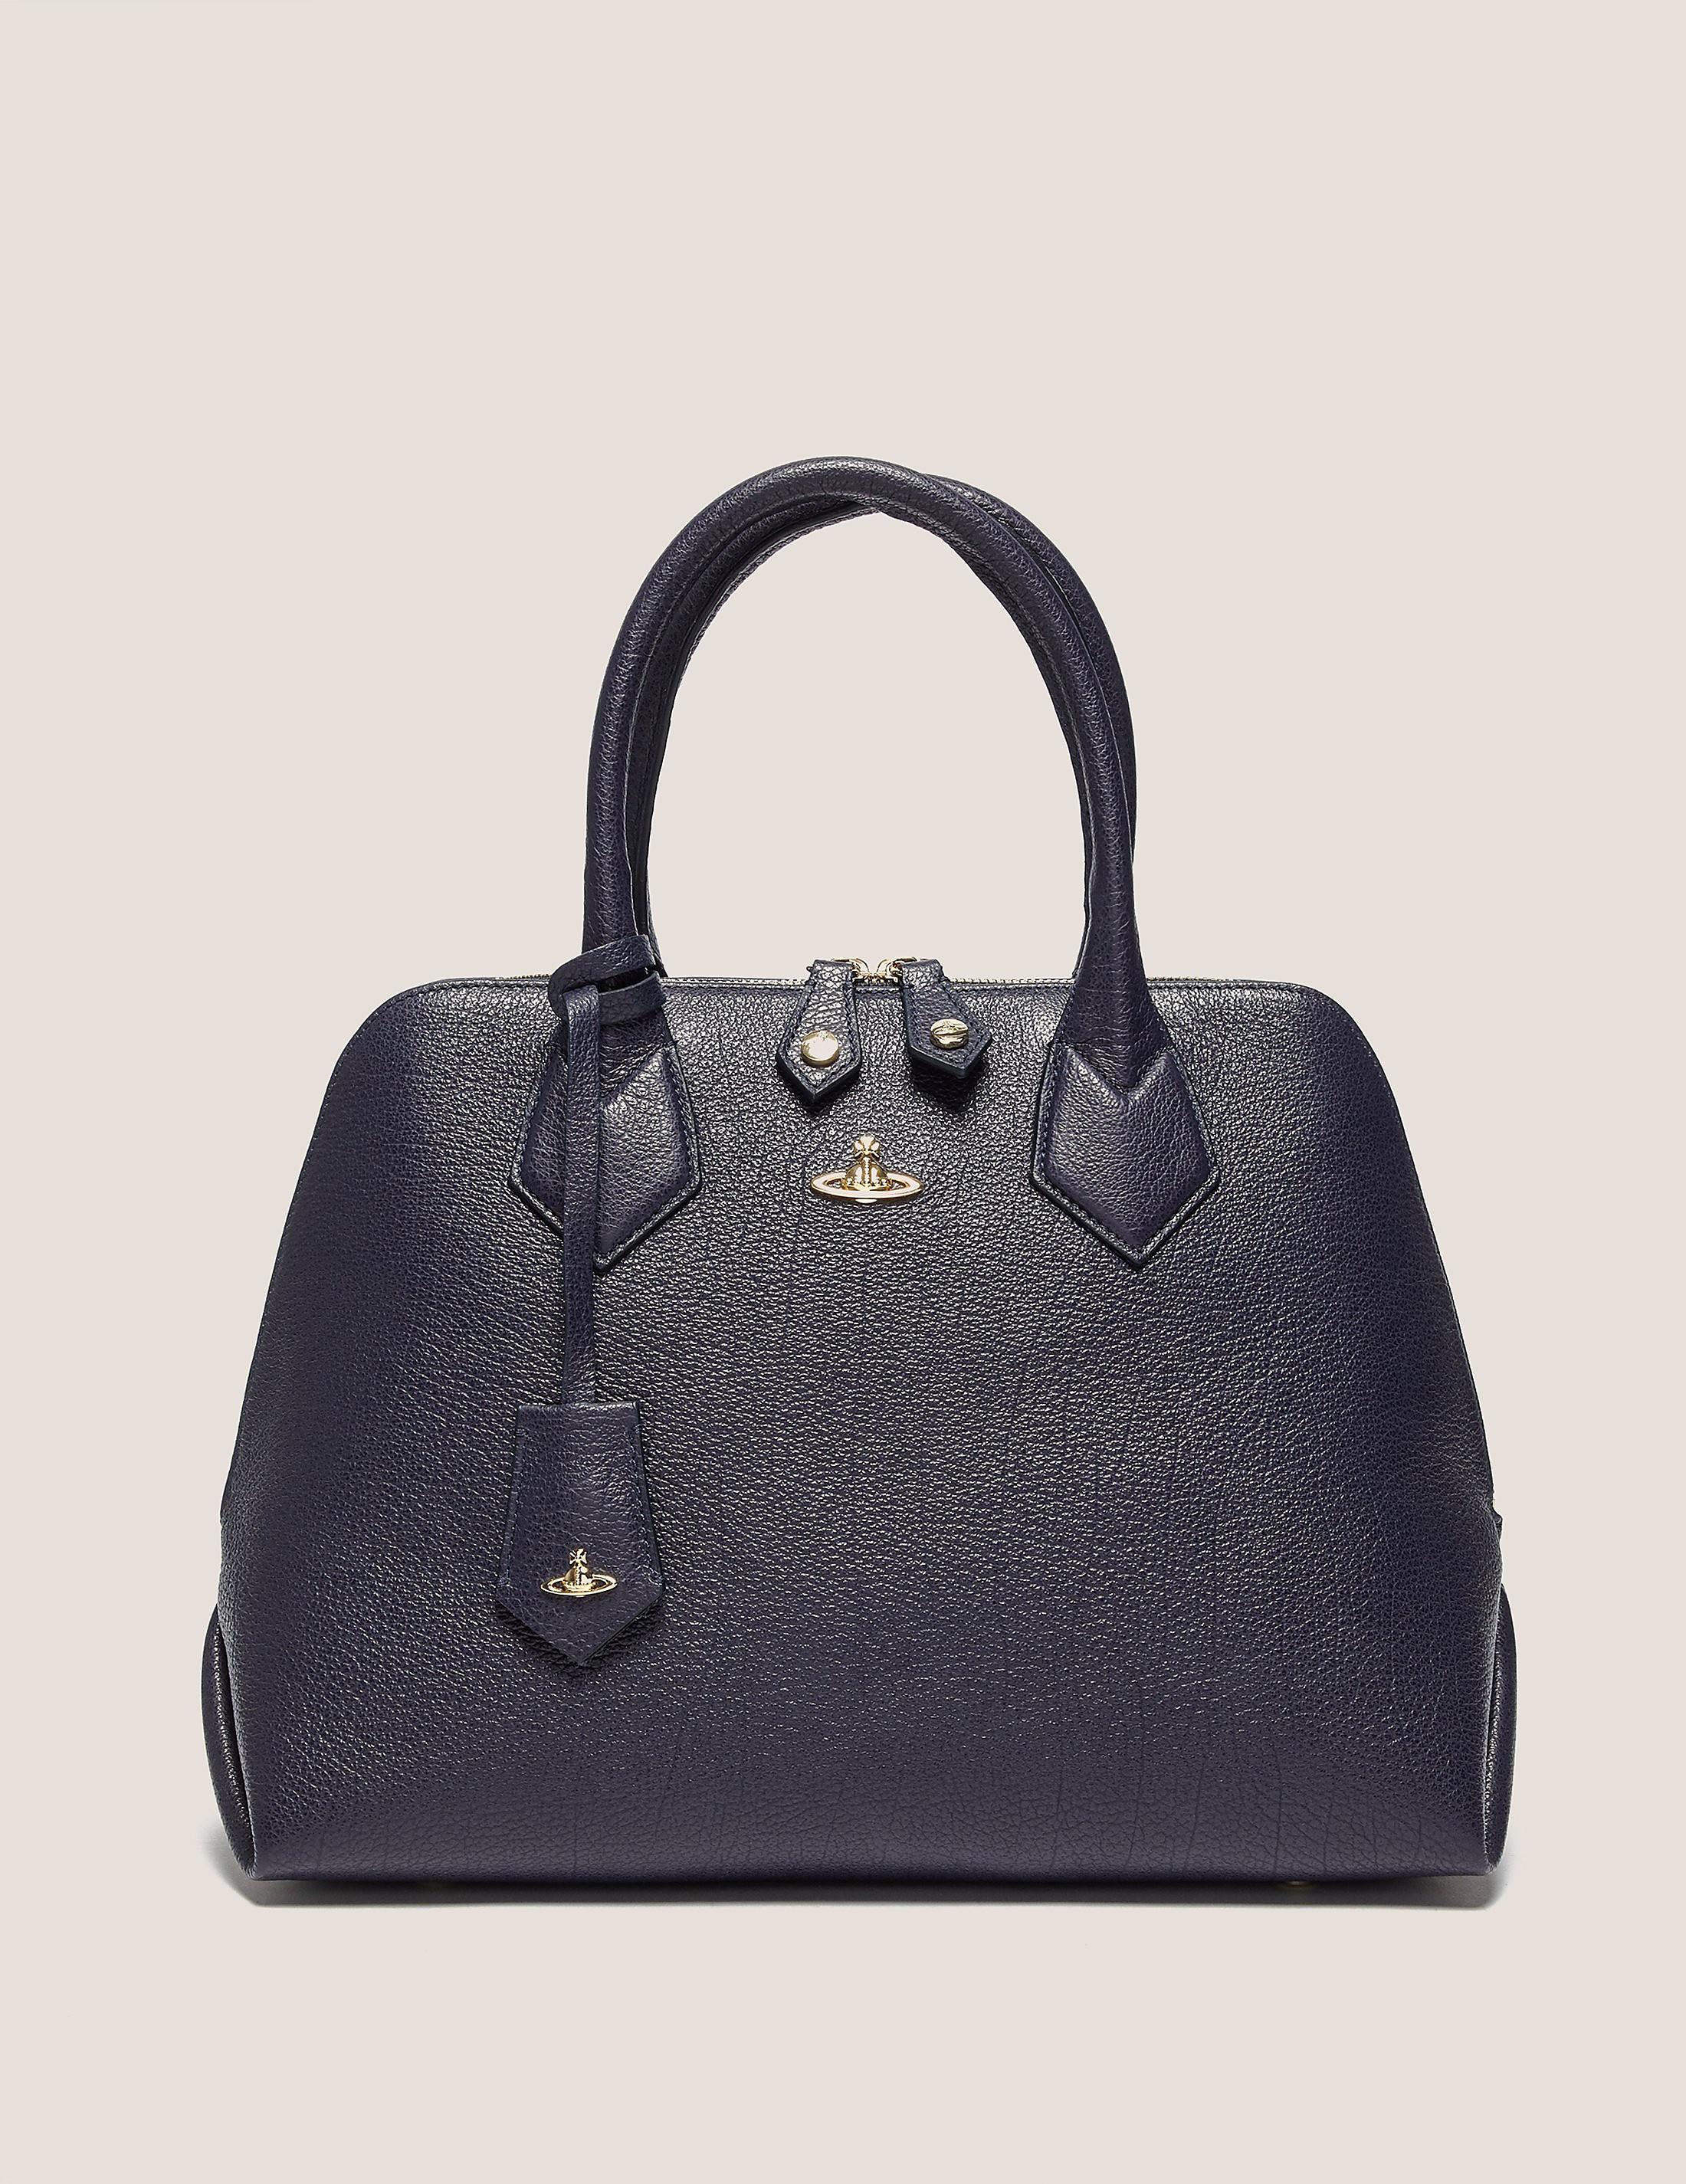 Vivienne Westwood Balmoral Large Bag